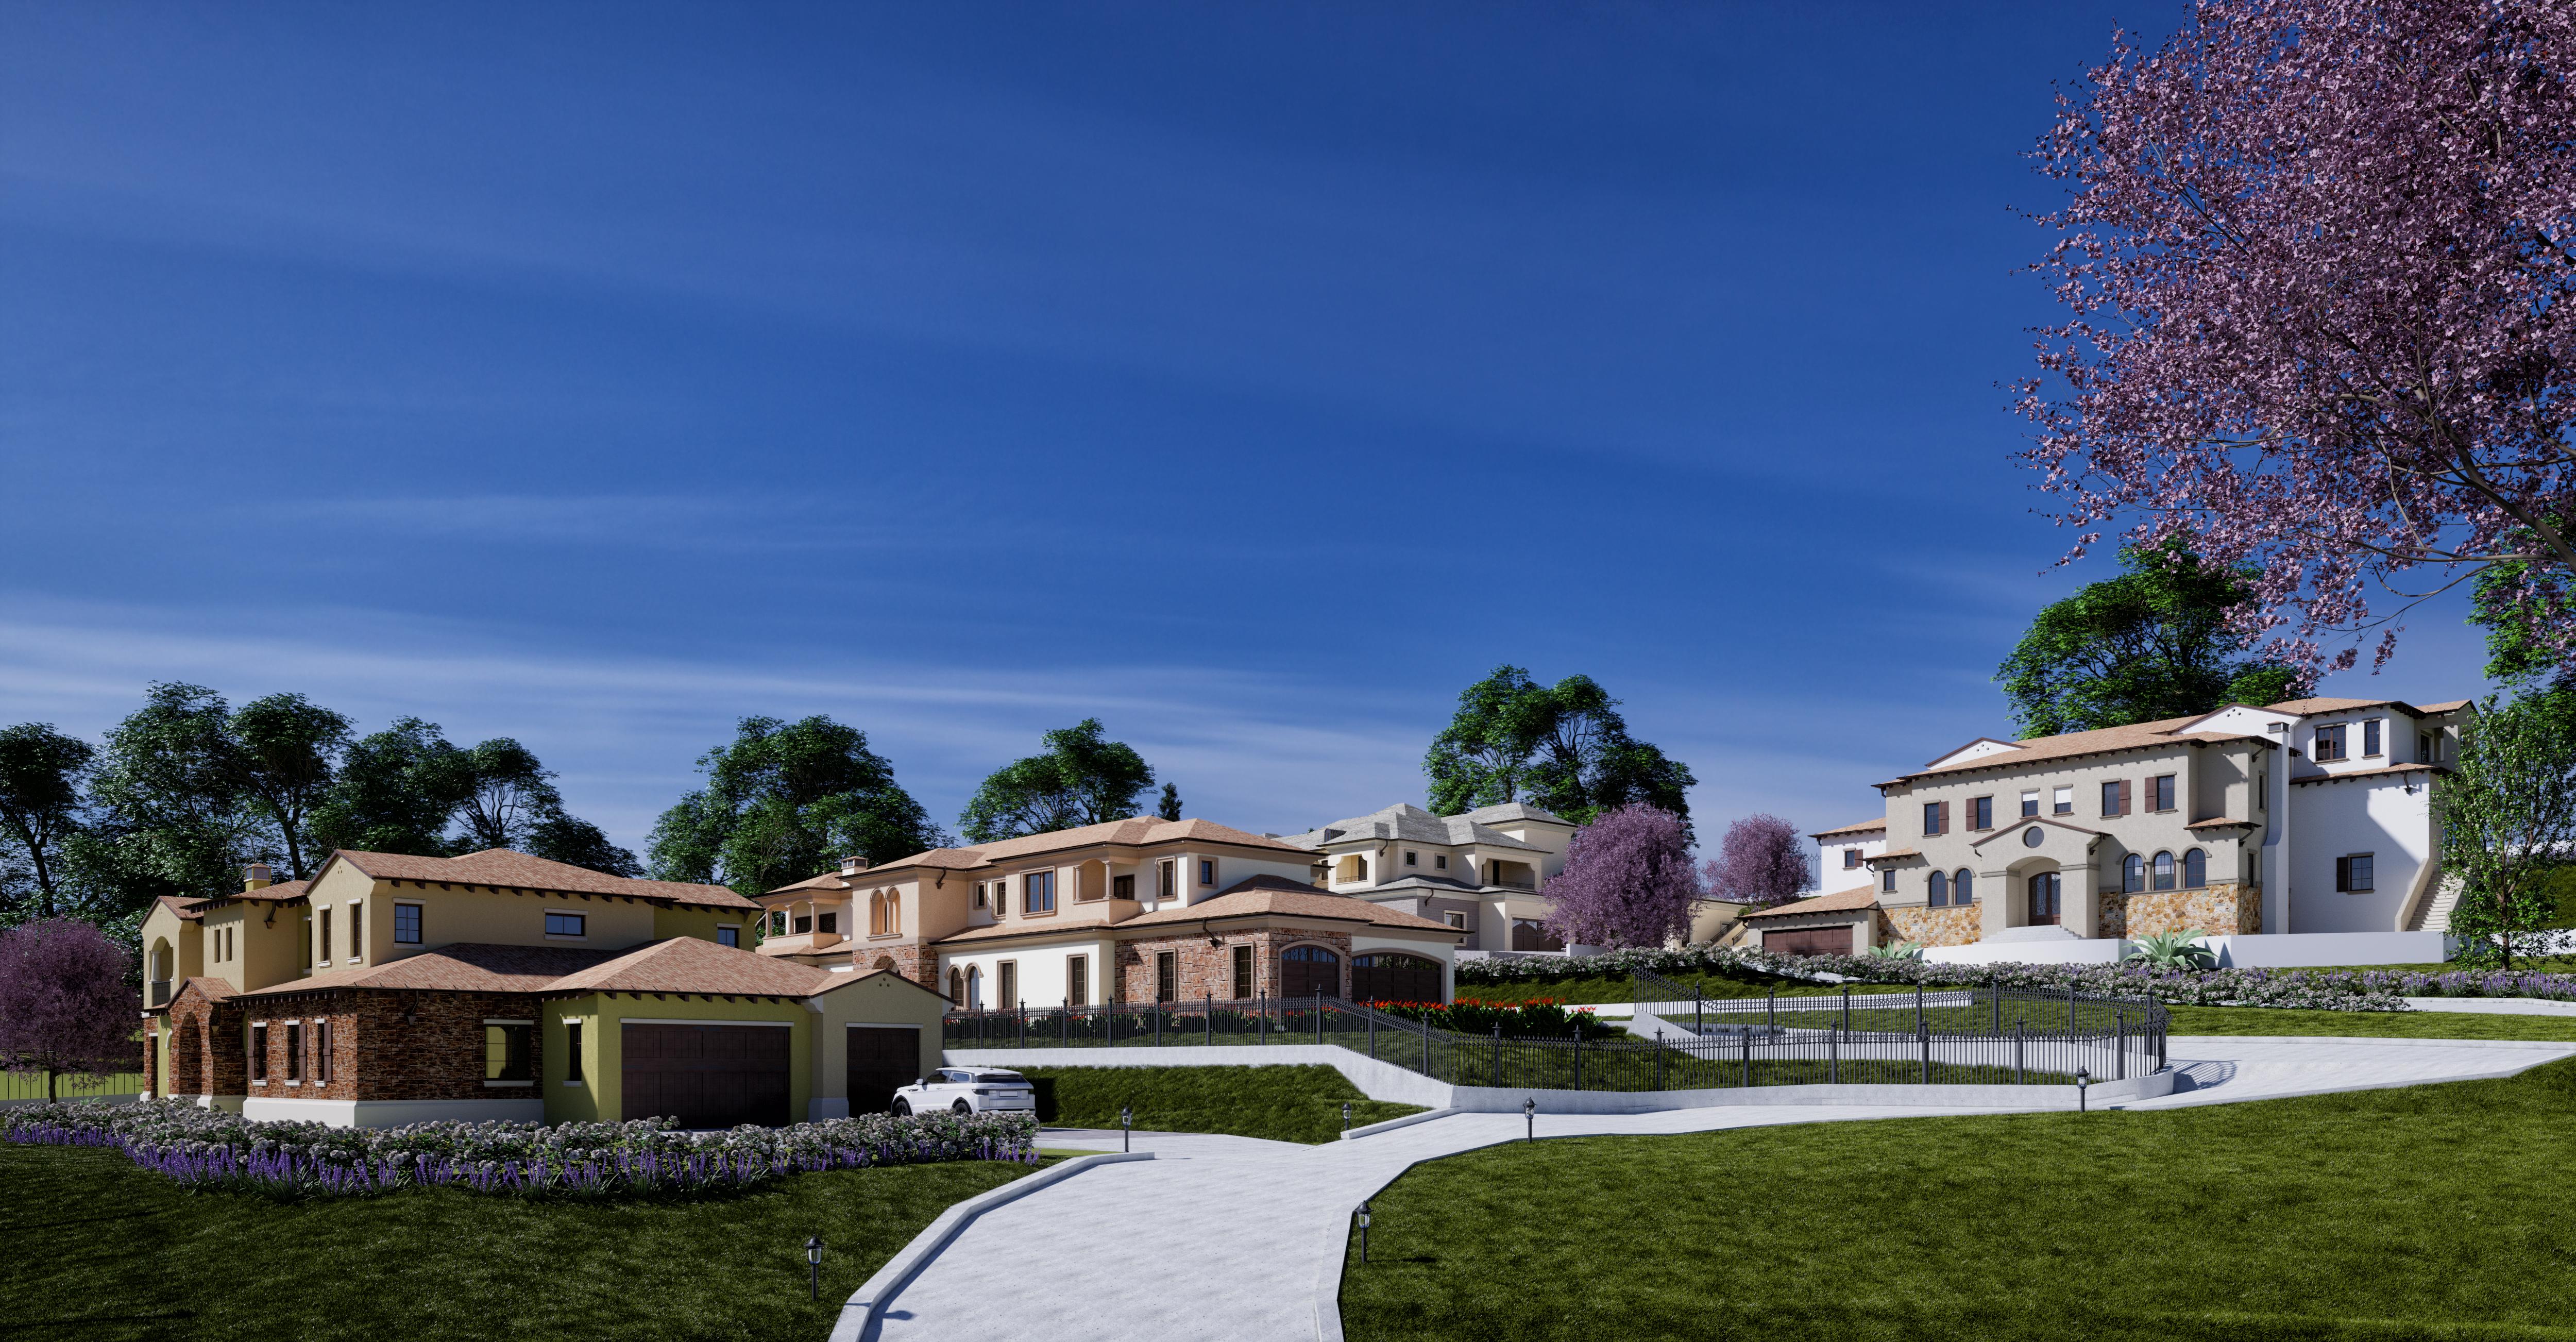 4 HOUSE - 1